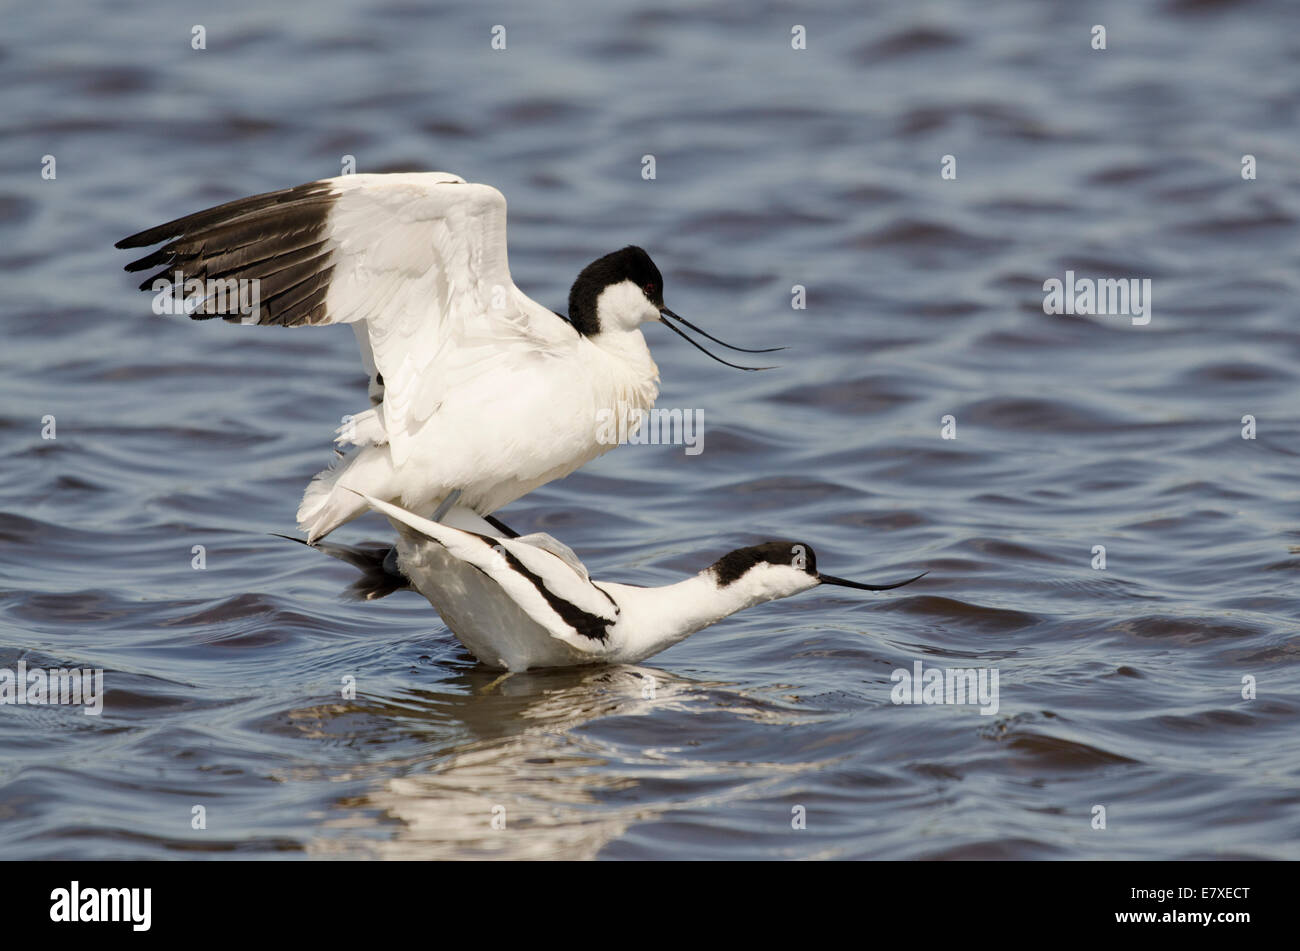 Avocets mating in shallow water Recurvirostra avosetta - Stock Image